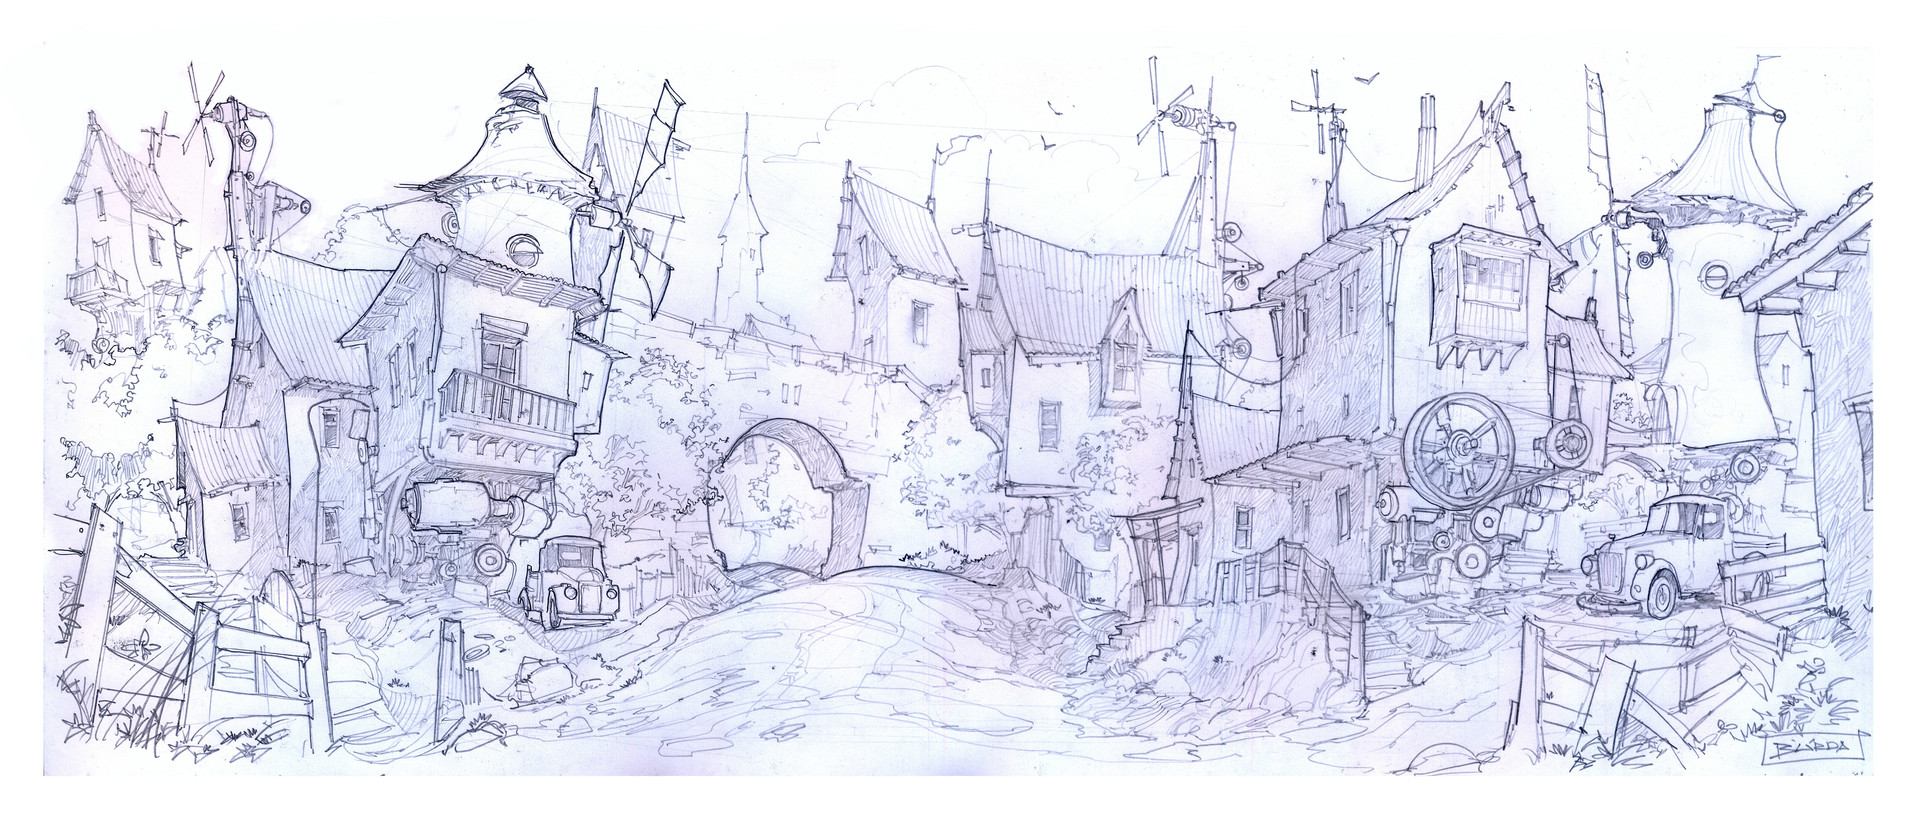 Alejandro burdisio bocetos1 hdlm alternativa 2